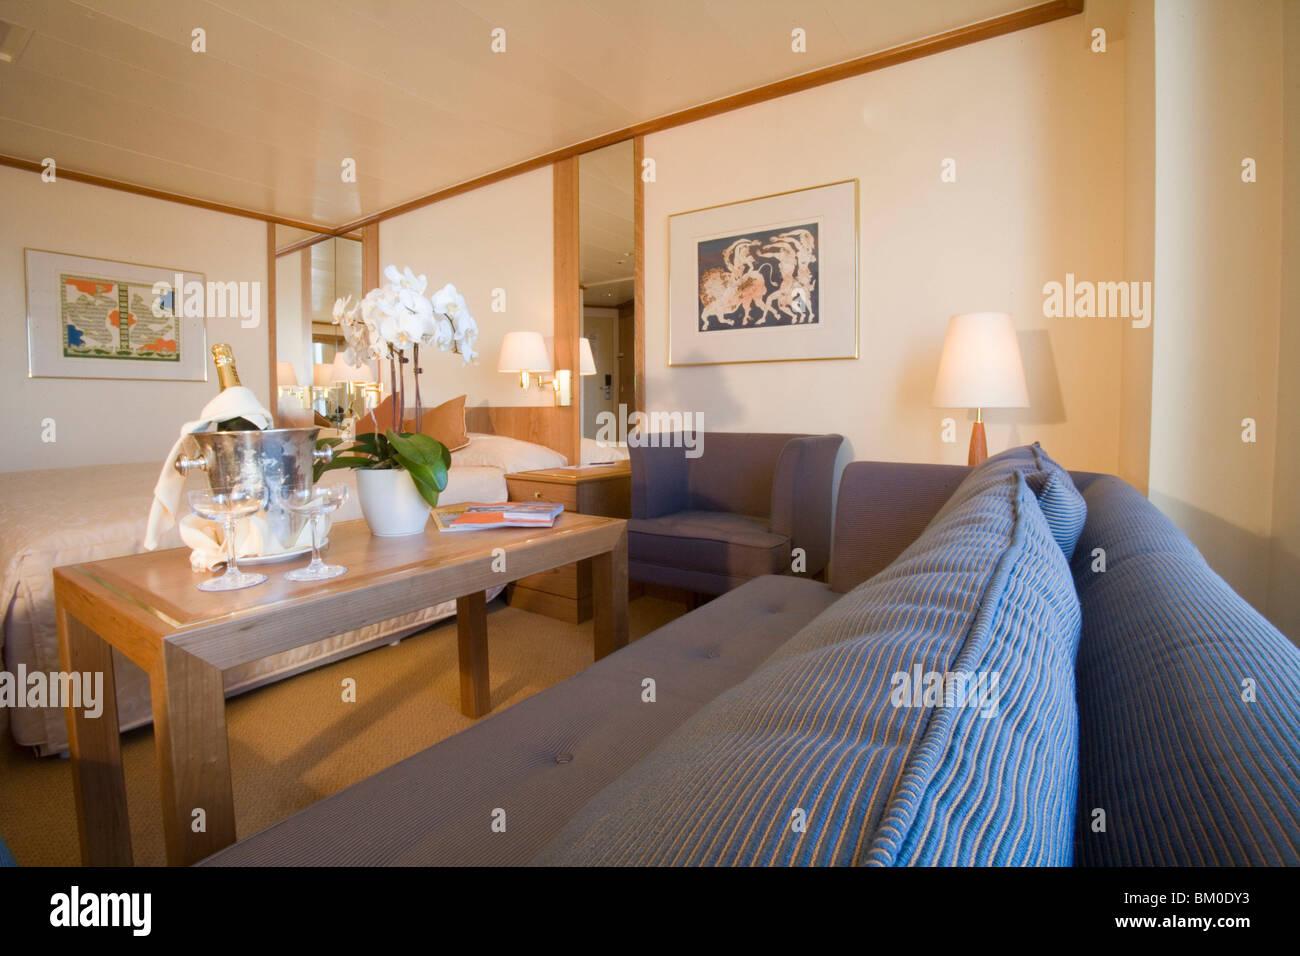 MS Bremen Category 7 Balcony Suite, Aboard MS Bremen Cruise Ship, Hapag-Lloyd Kreuzfahrten, Germany - Stock Image